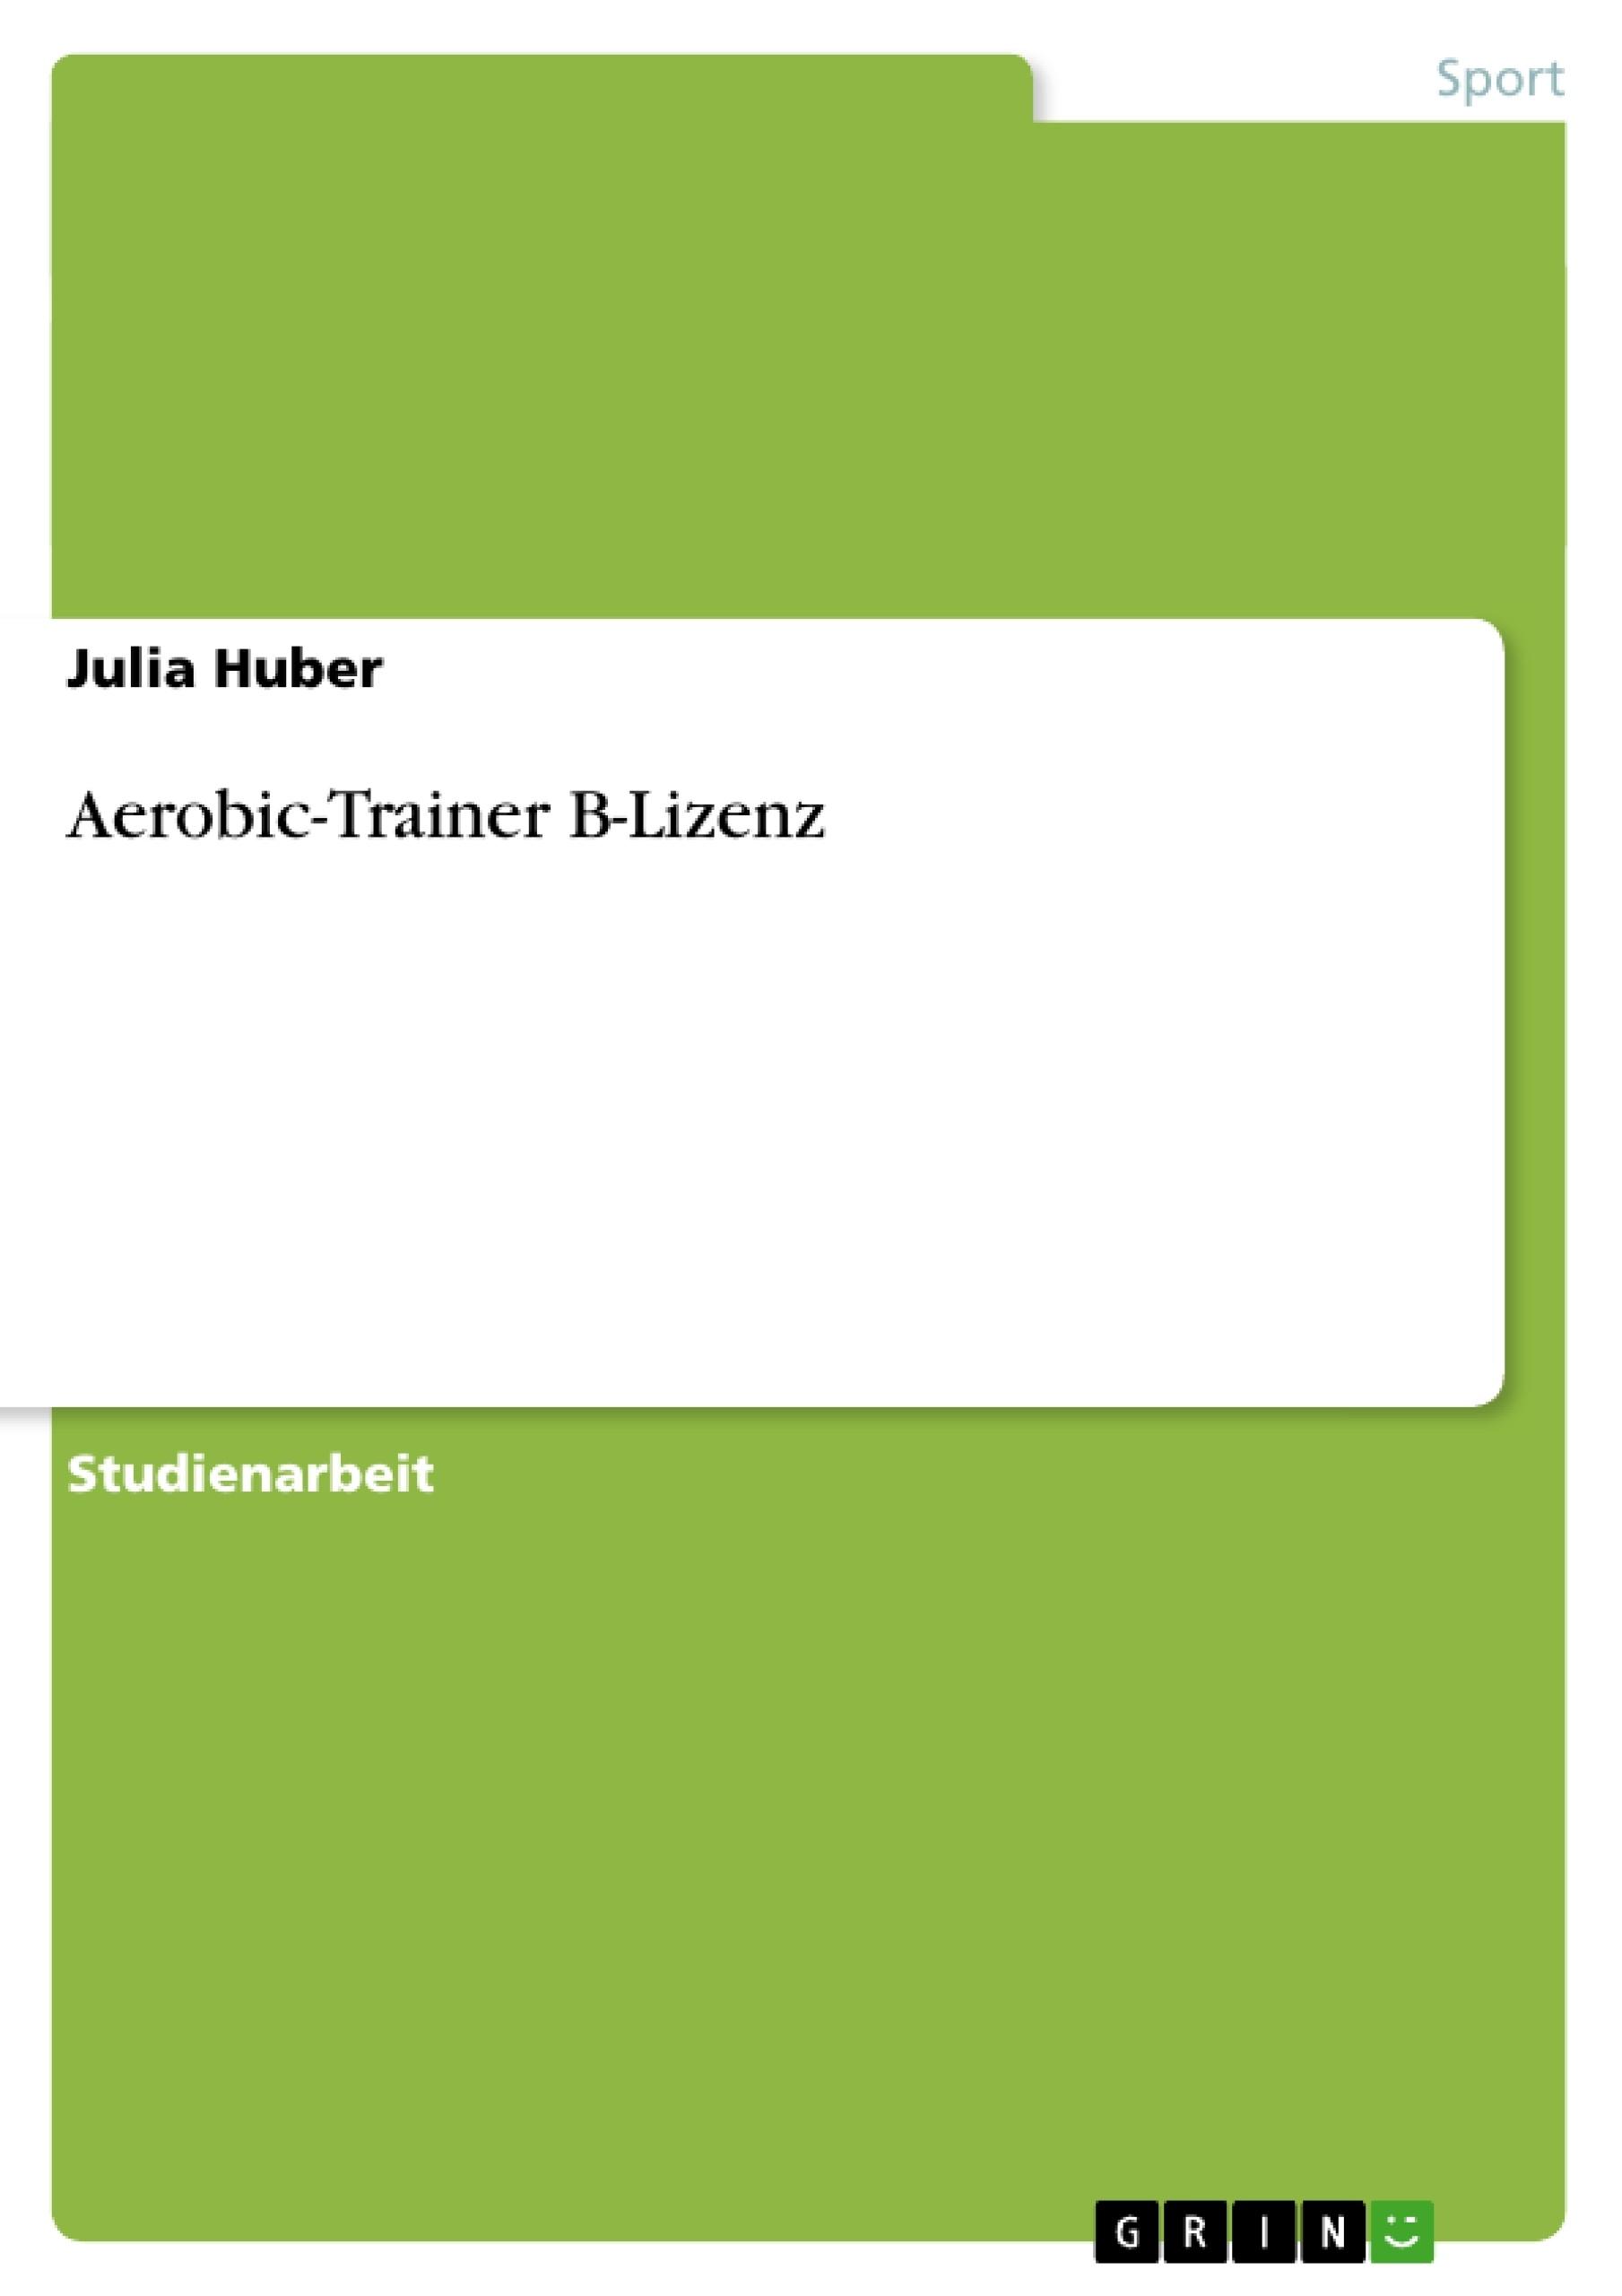 Titel: Aerobic-Trainer B-Lizenz